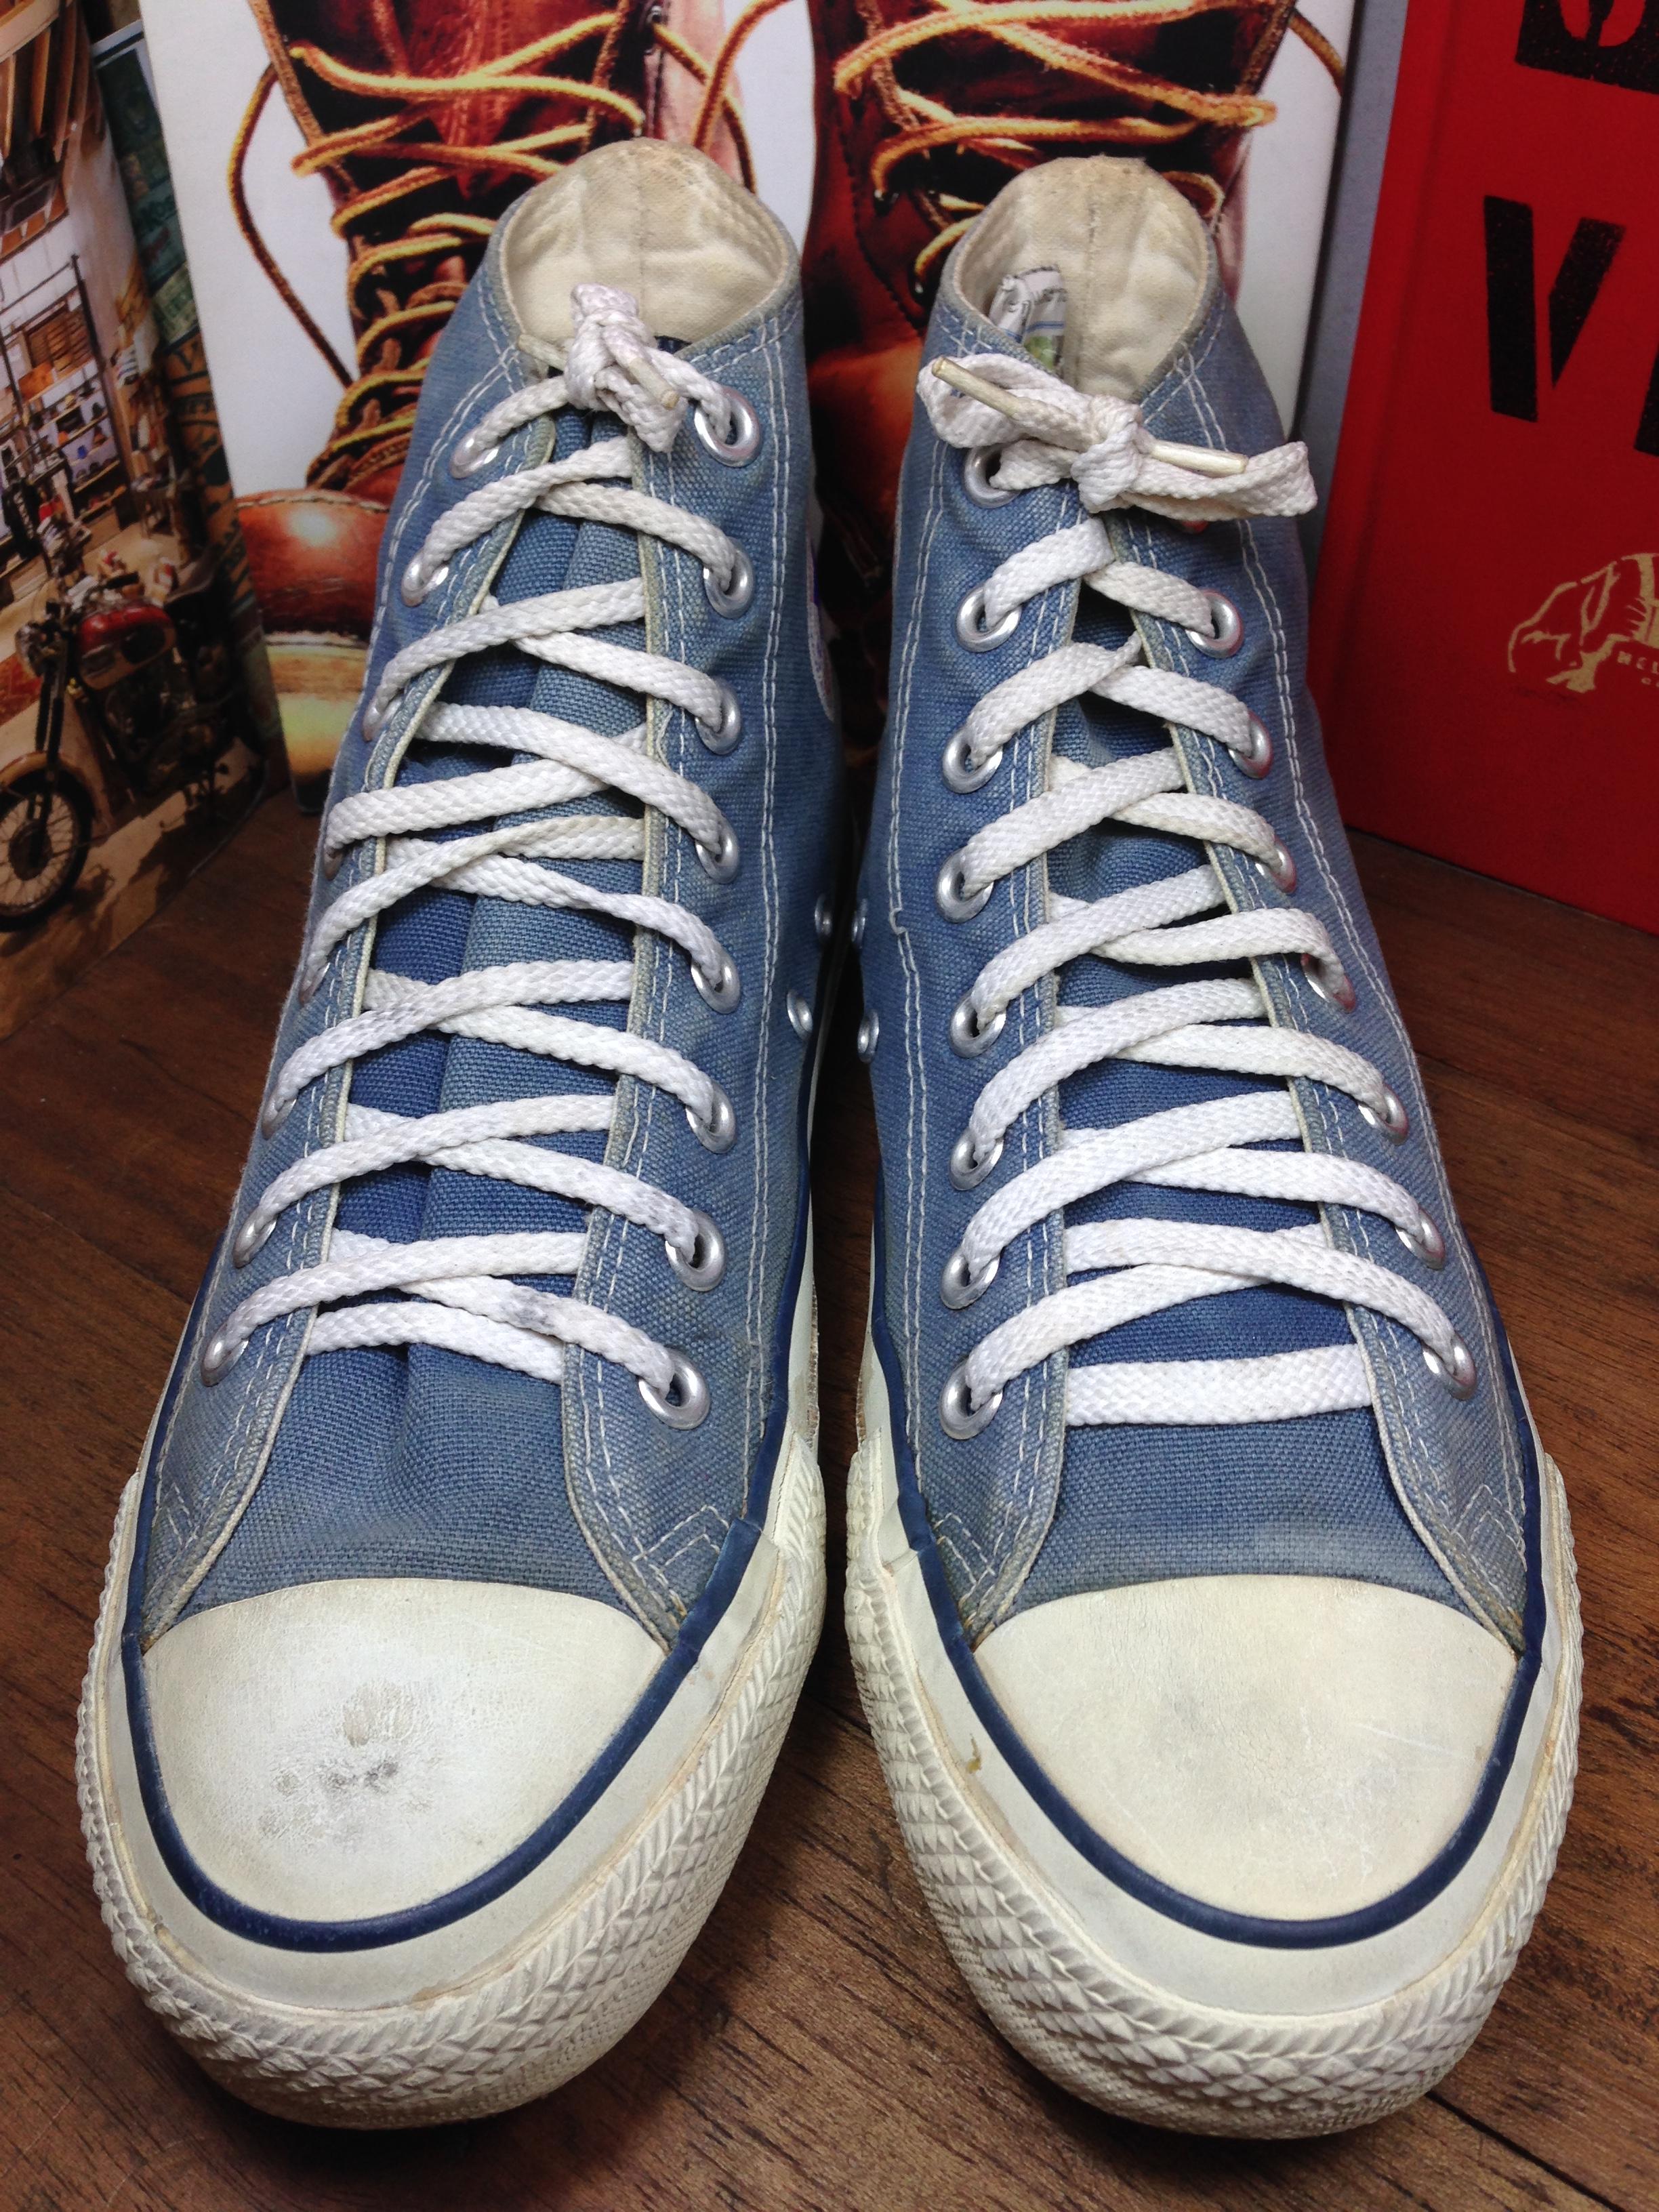 28.Converse USA 90's size 8 ตามรูปครับ ราคา 1200